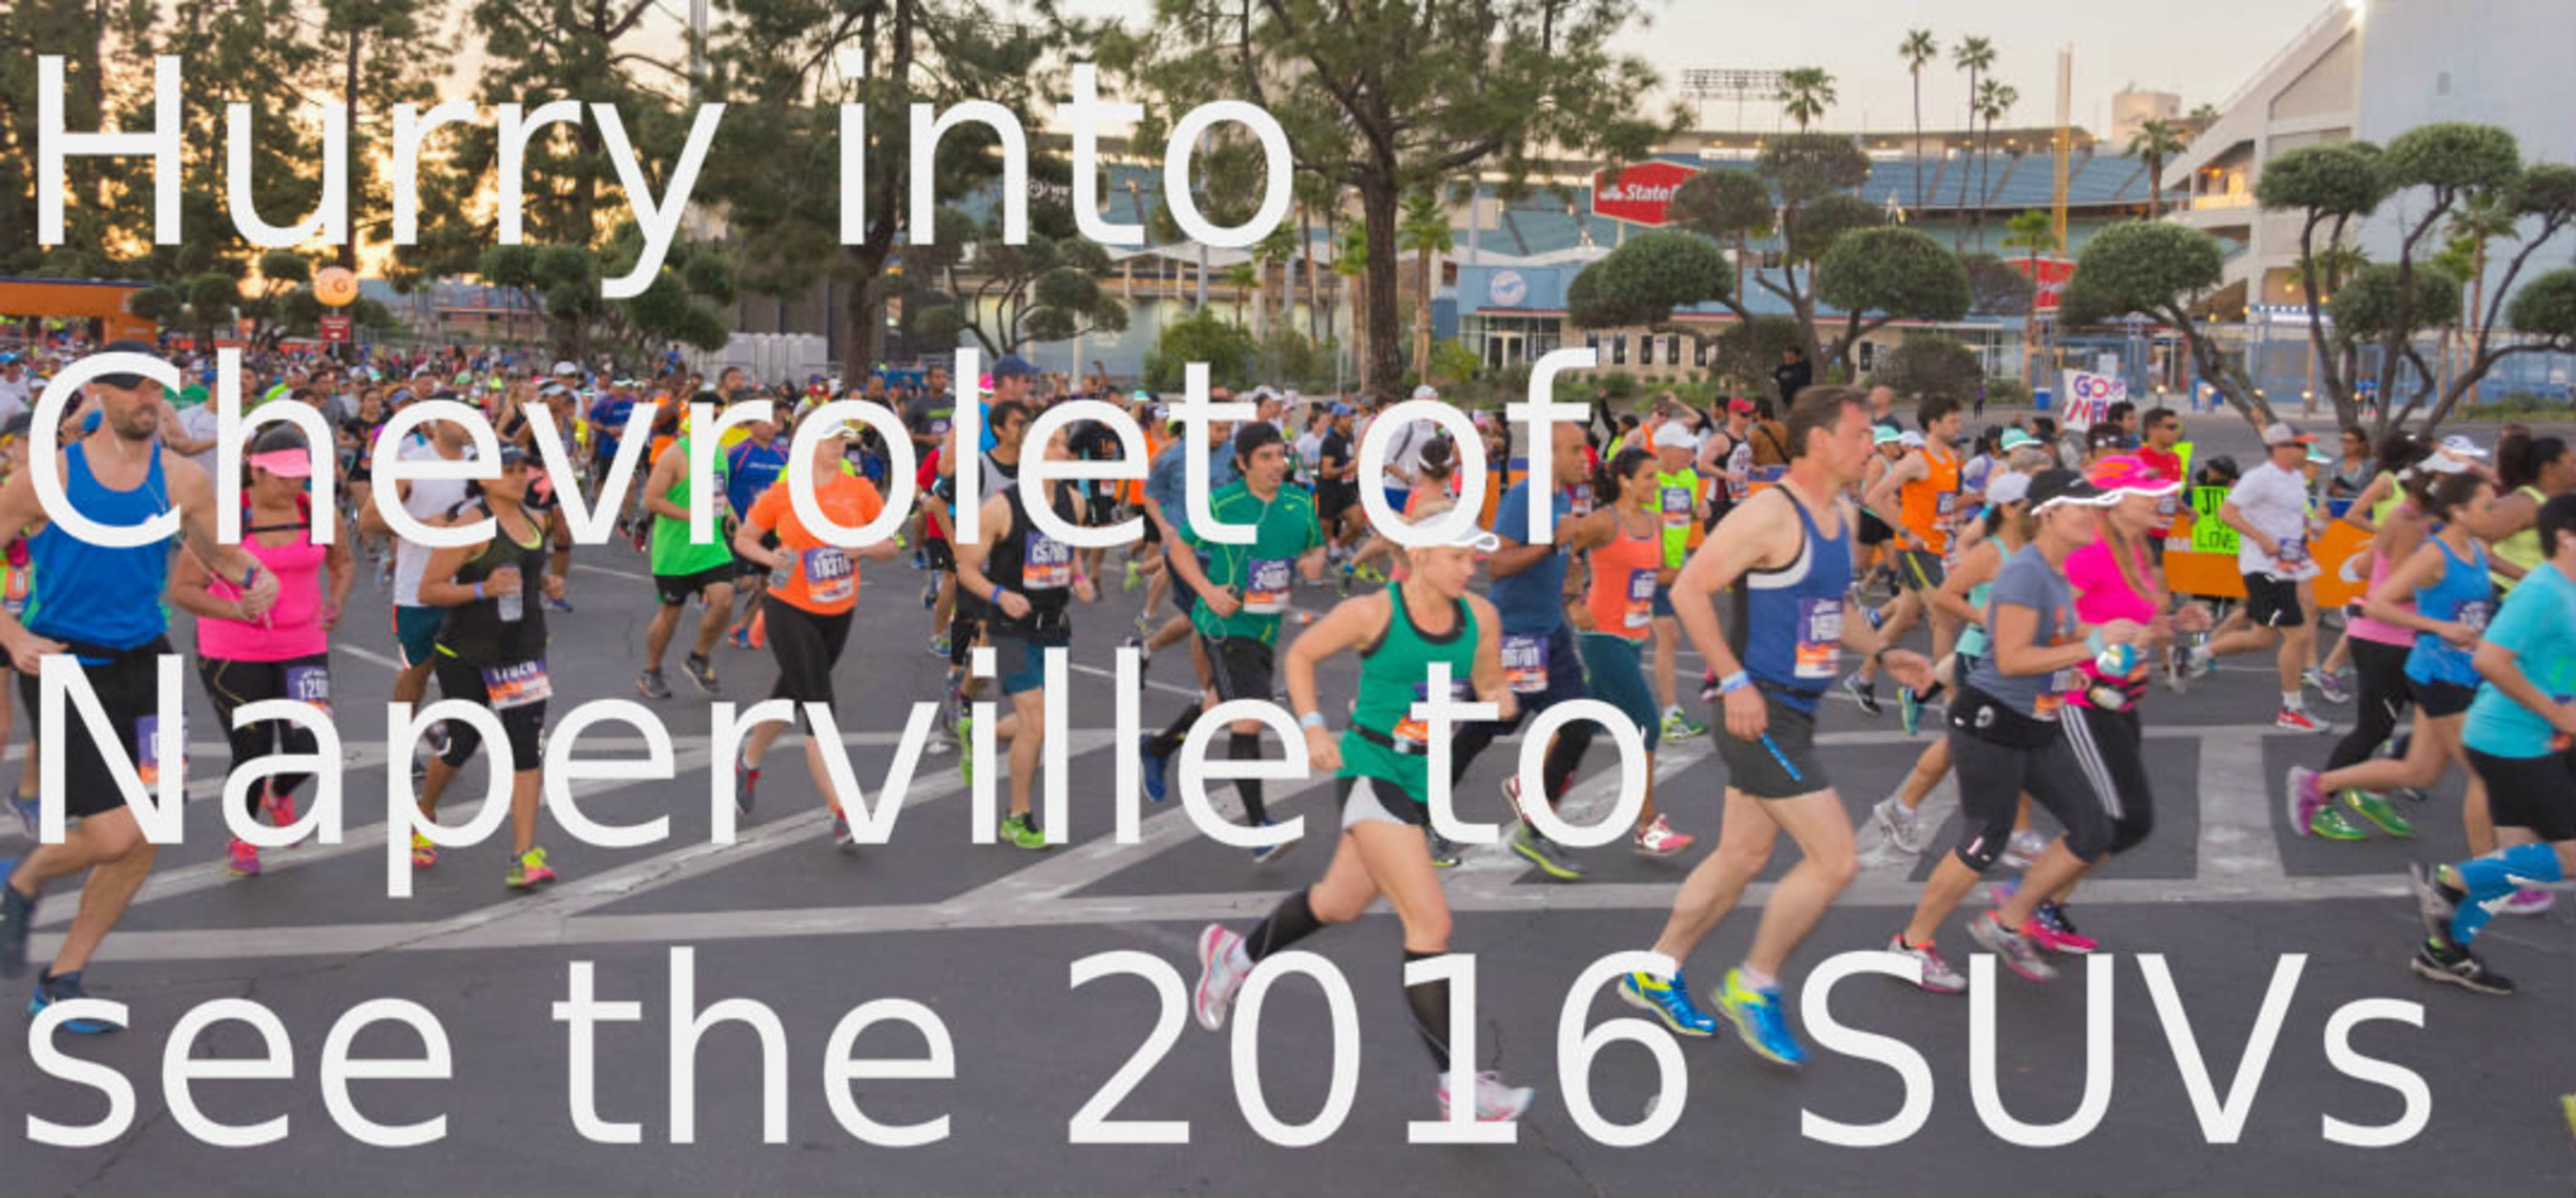 2016 models arrive to Chevrolet of Naperville